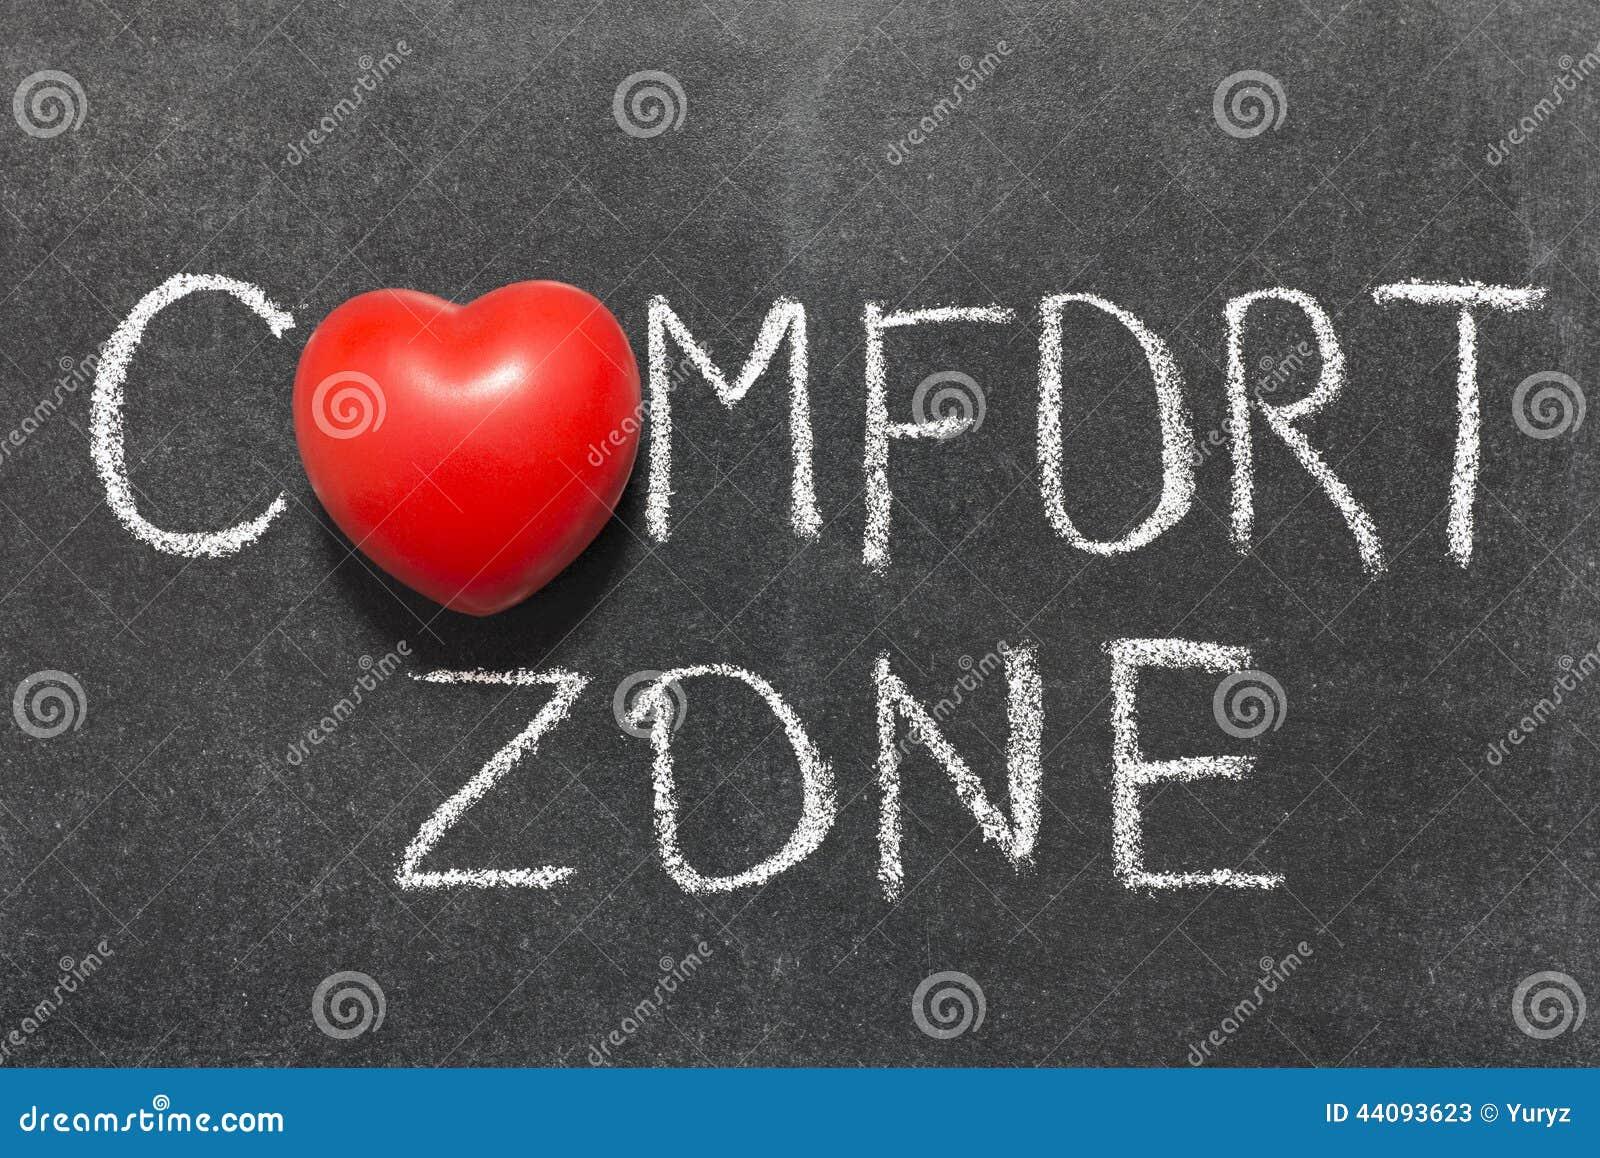 comfort zone stock photo image 44093623. Black Bedroom Furniture Sets. Home Design Ideas